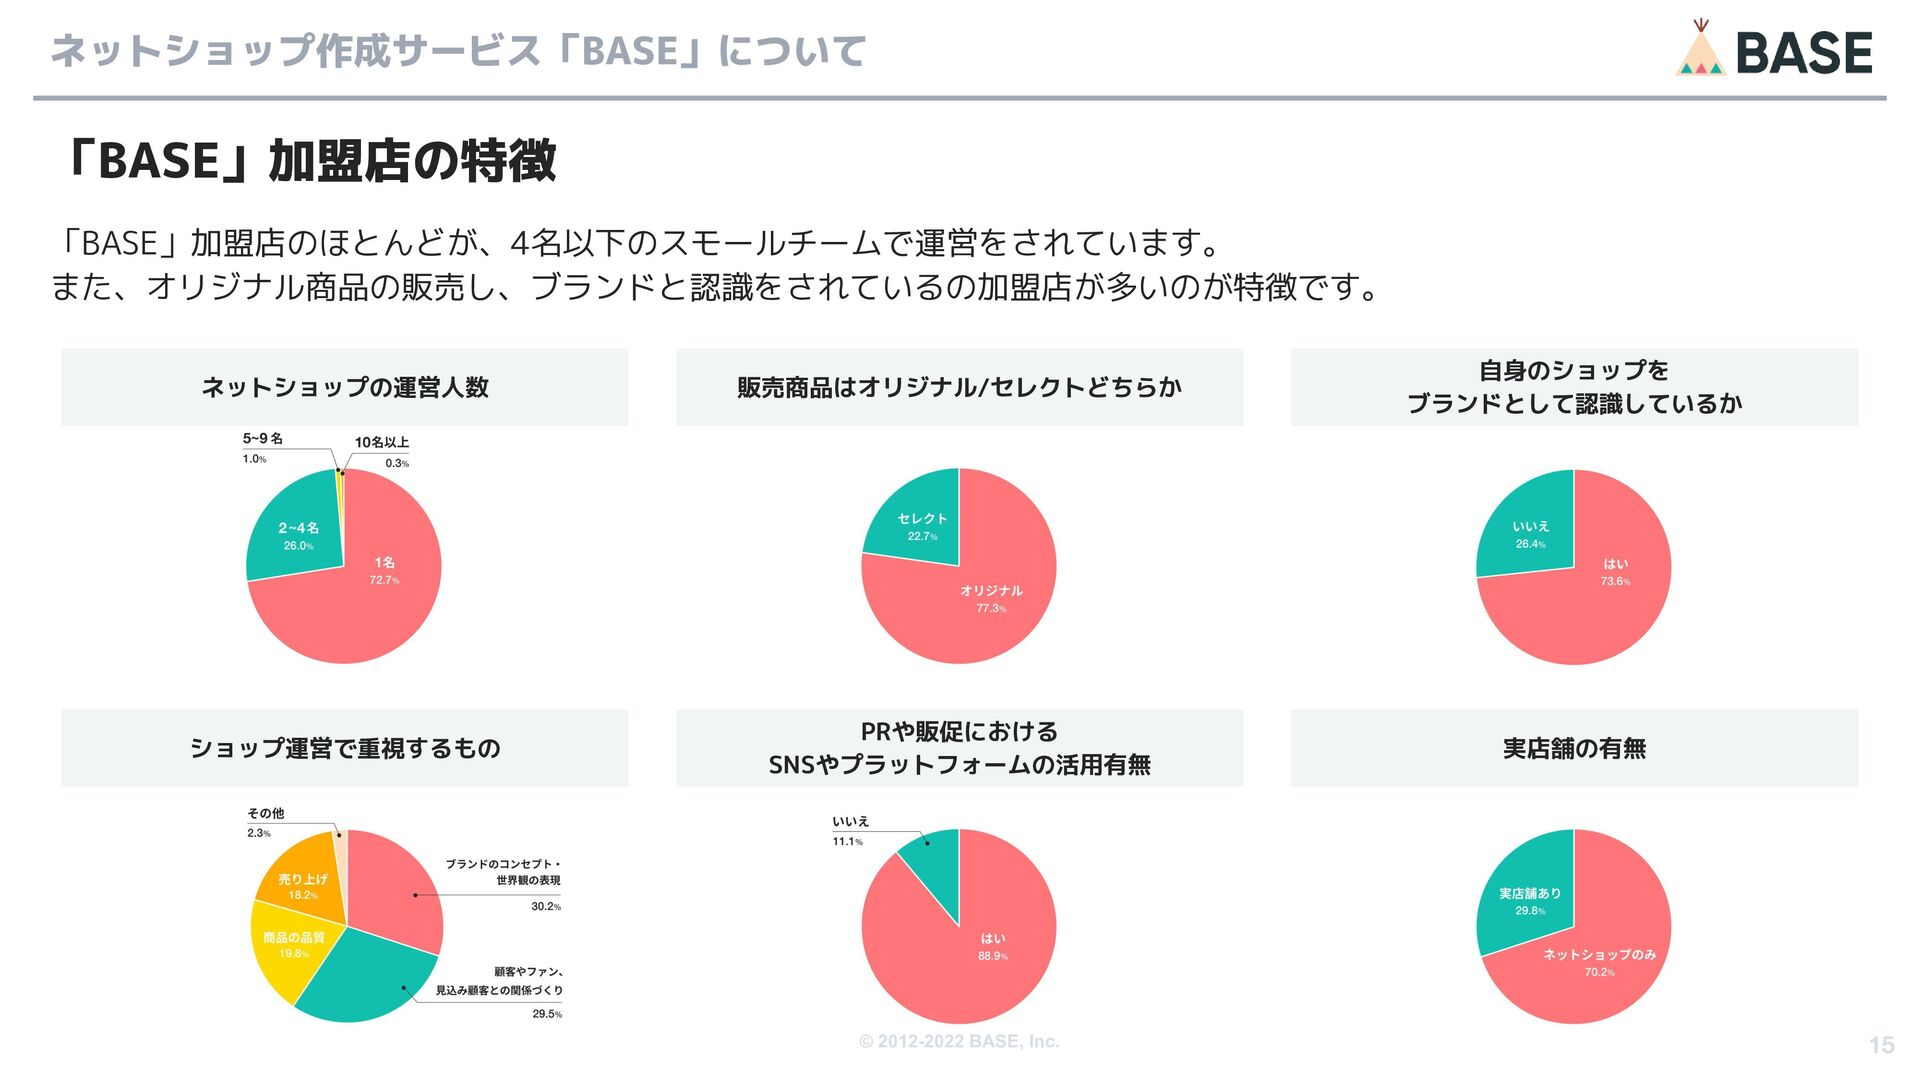 © 2012-2020 BASE, Inc. Eコマースプラットフォーム「BASE」について ...